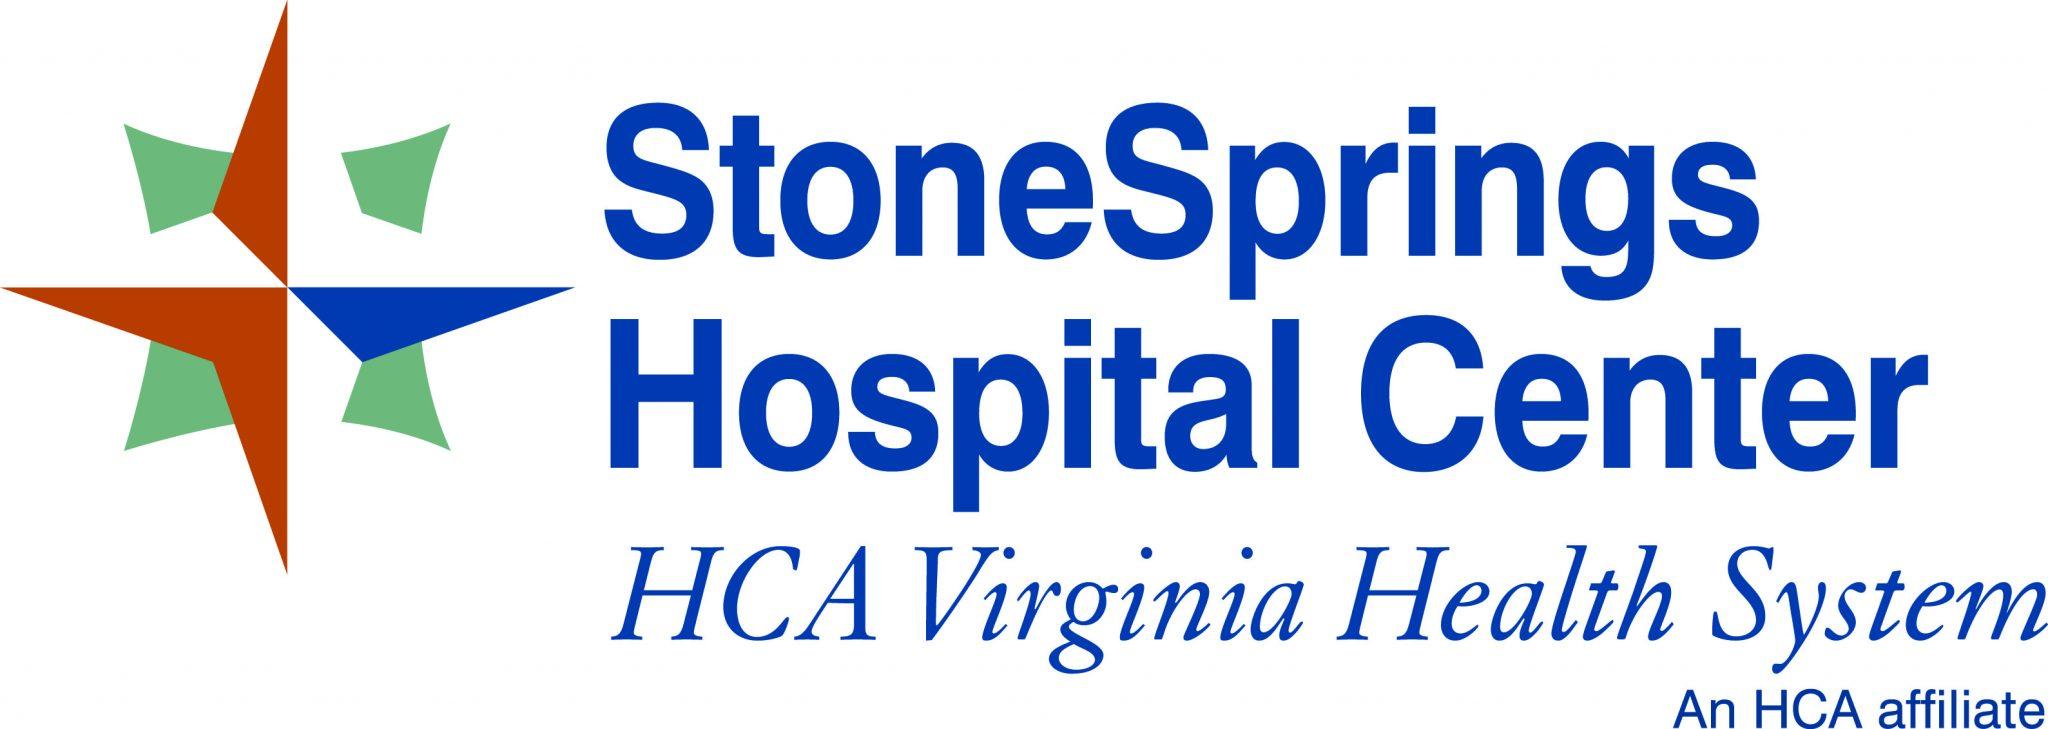 stone springs hospital logo